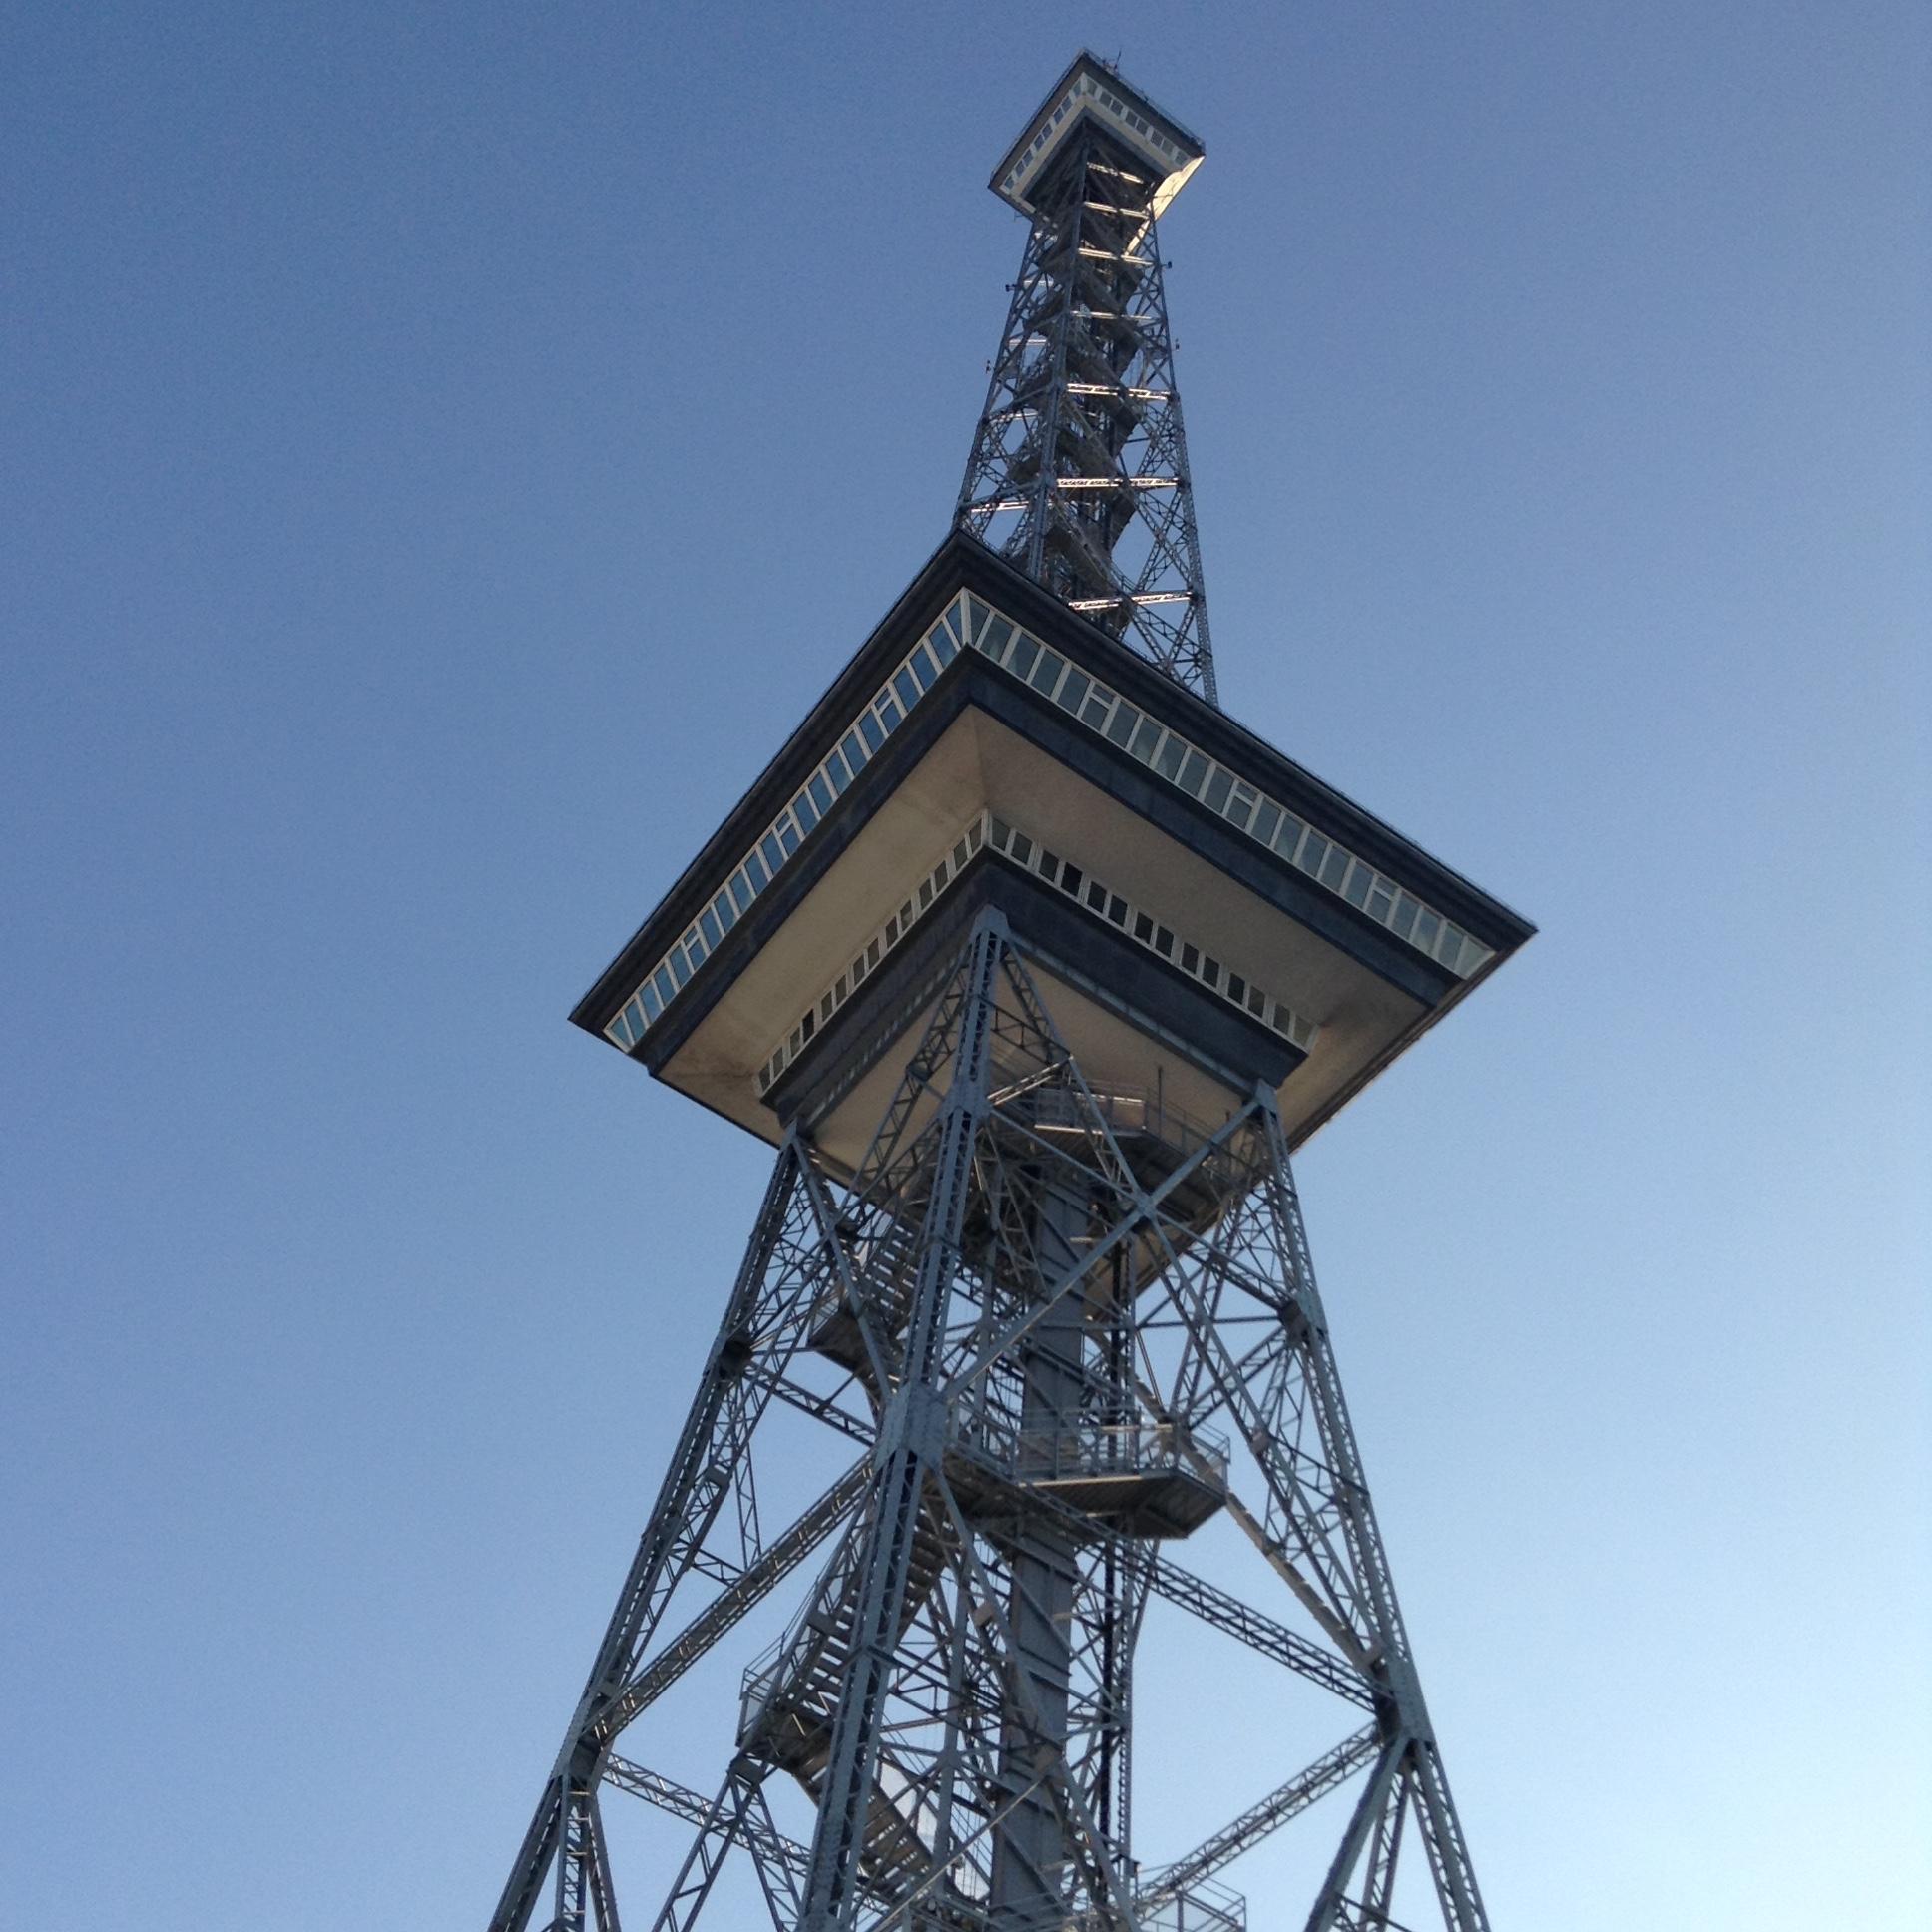 Berlin Radio Tower - the